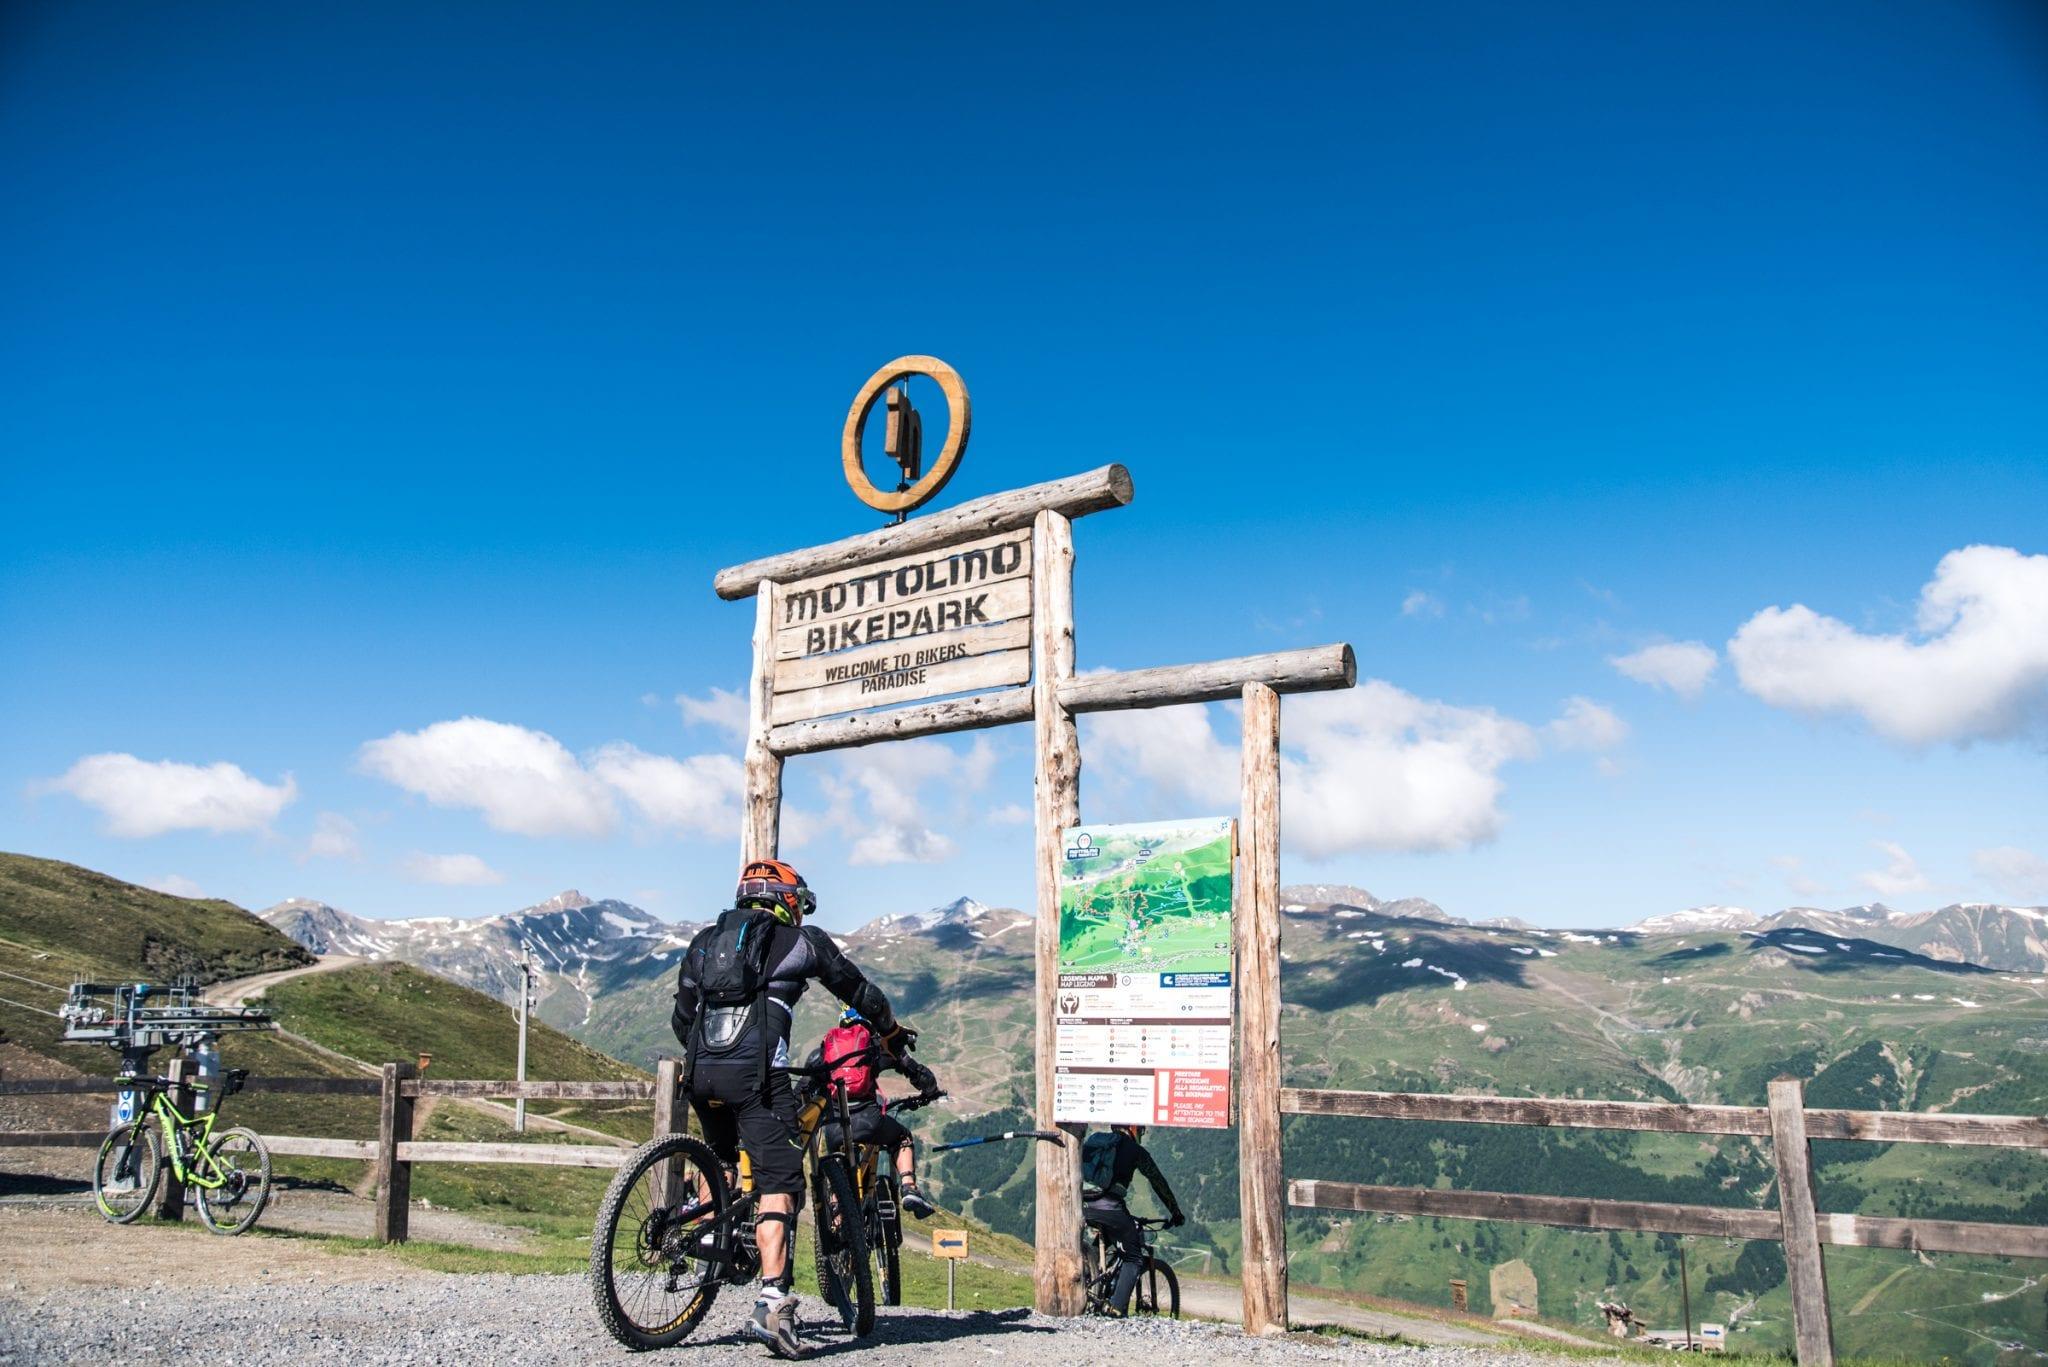 Mountainbiken-in-Livigno Mottolino